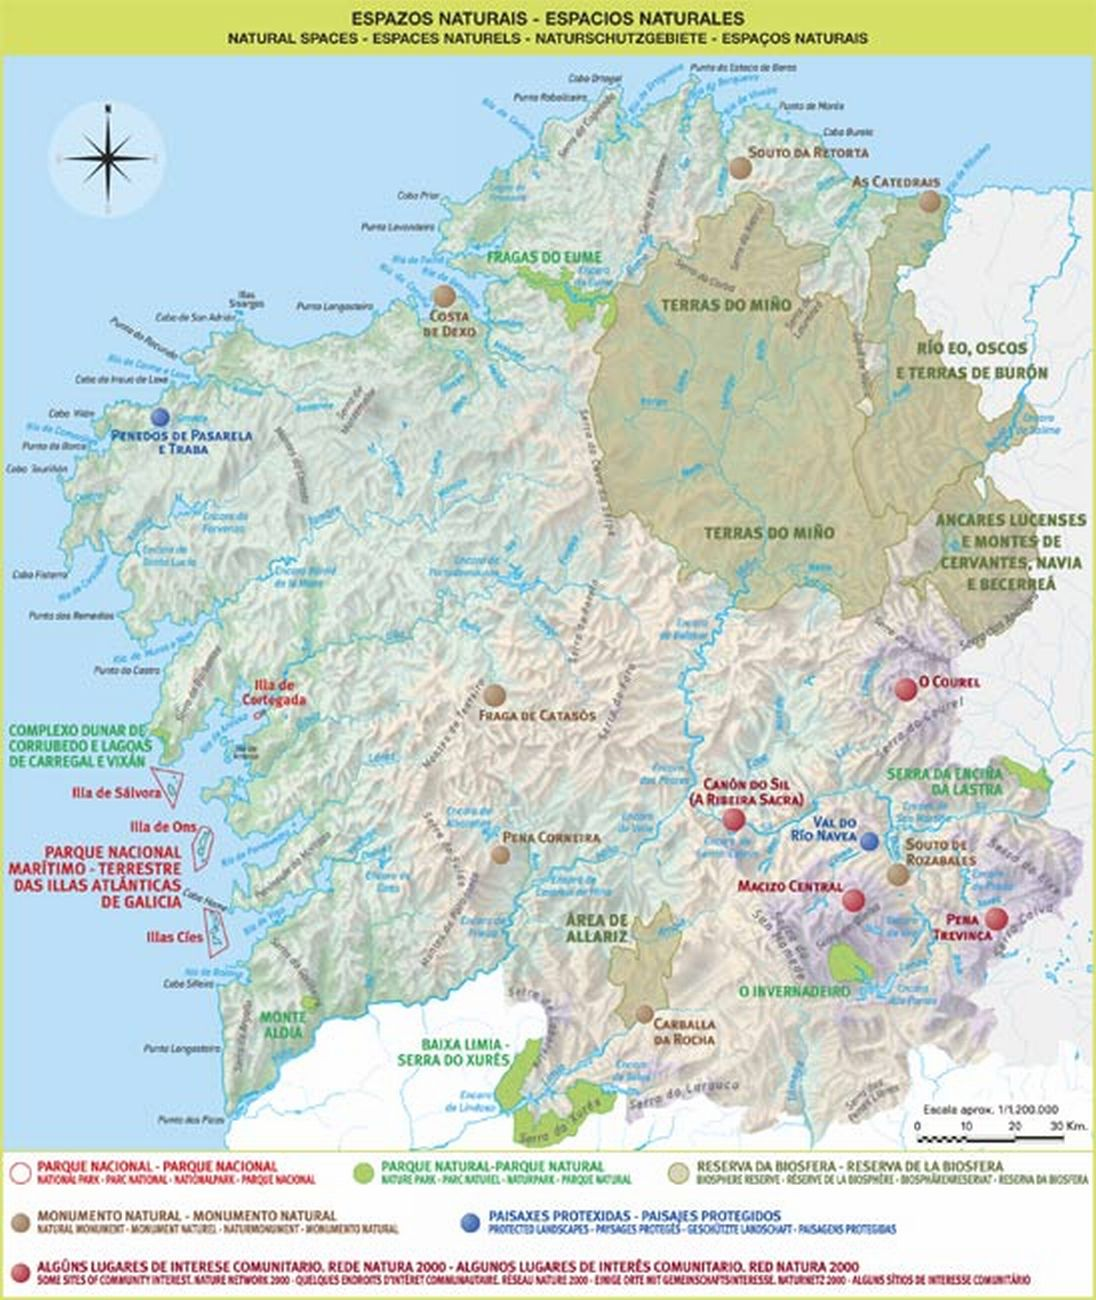 Mapa de Espacios Naturales de Galicia